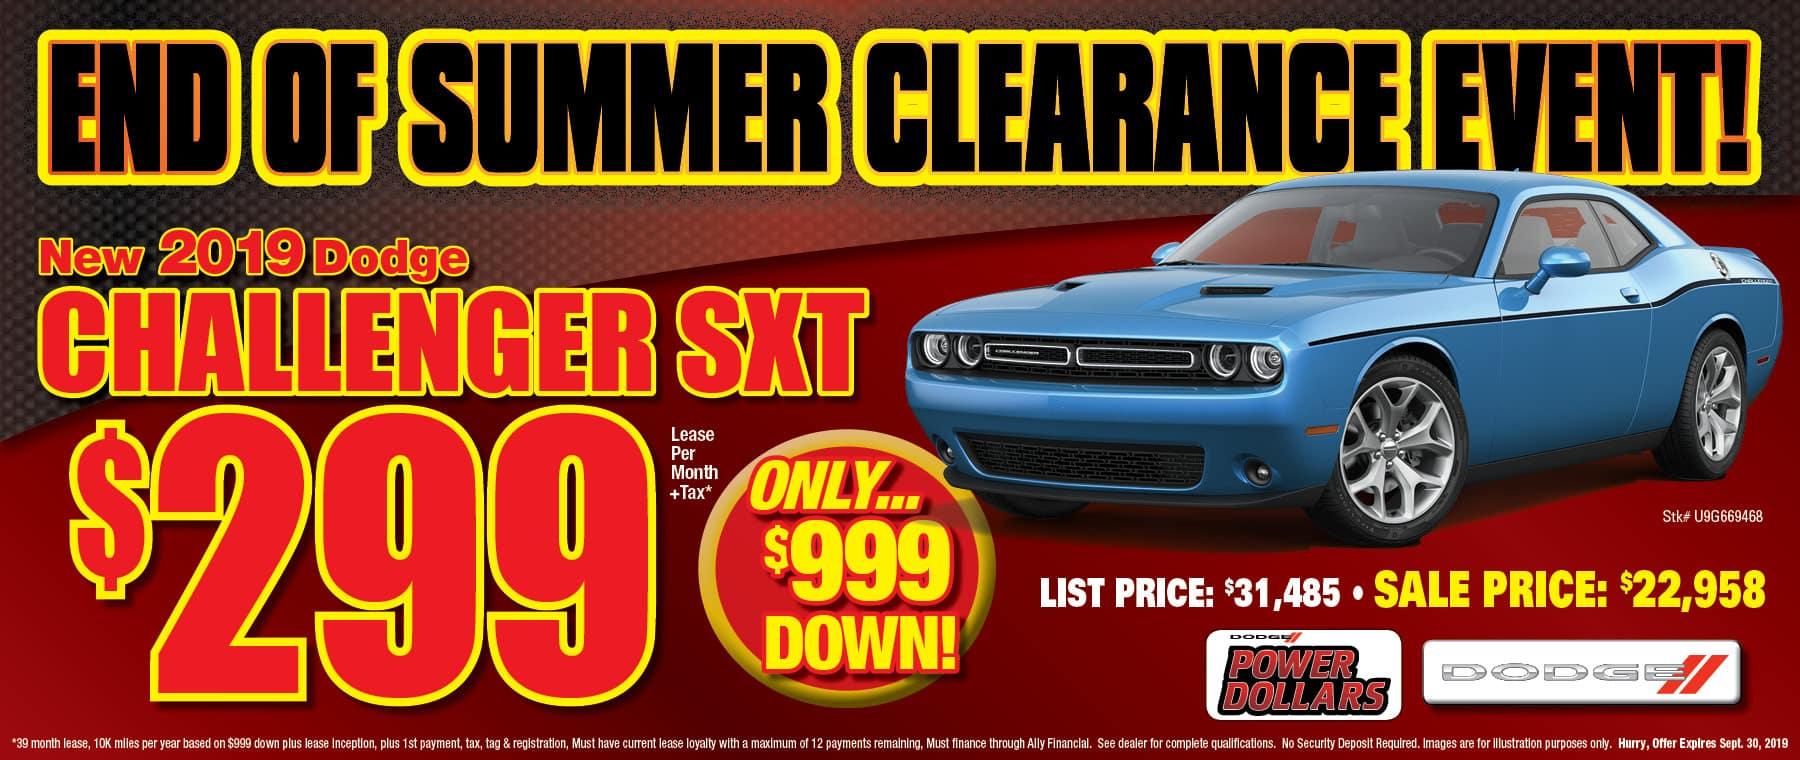 New 2019 Dodge Challenger SXT!